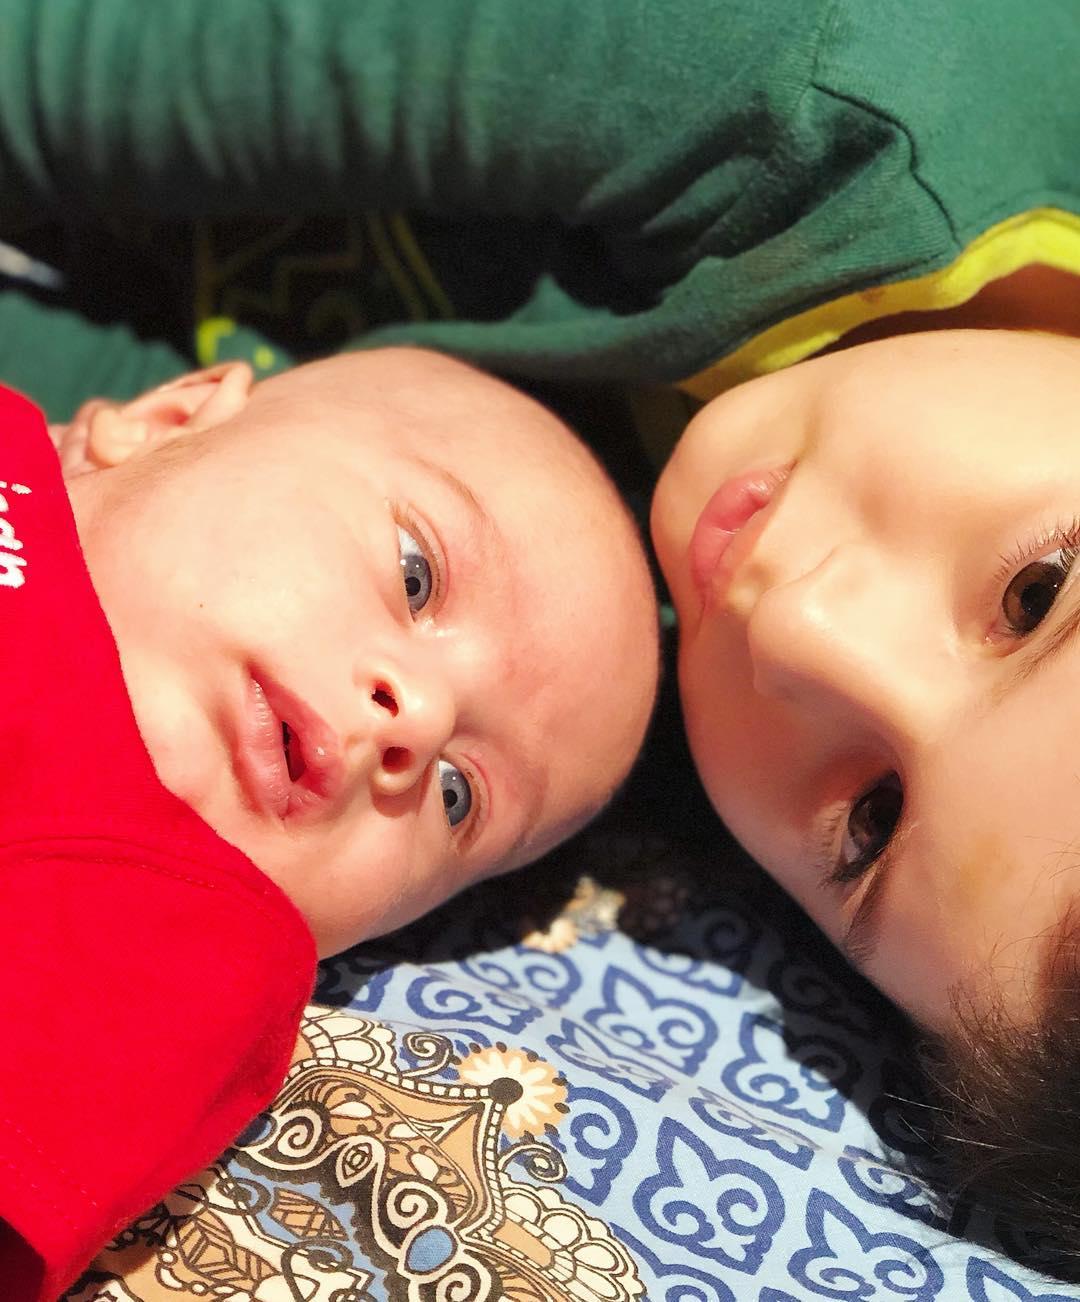 Fatima Effendi and Kanwar Arsalan New Born Baby Boy Pictures